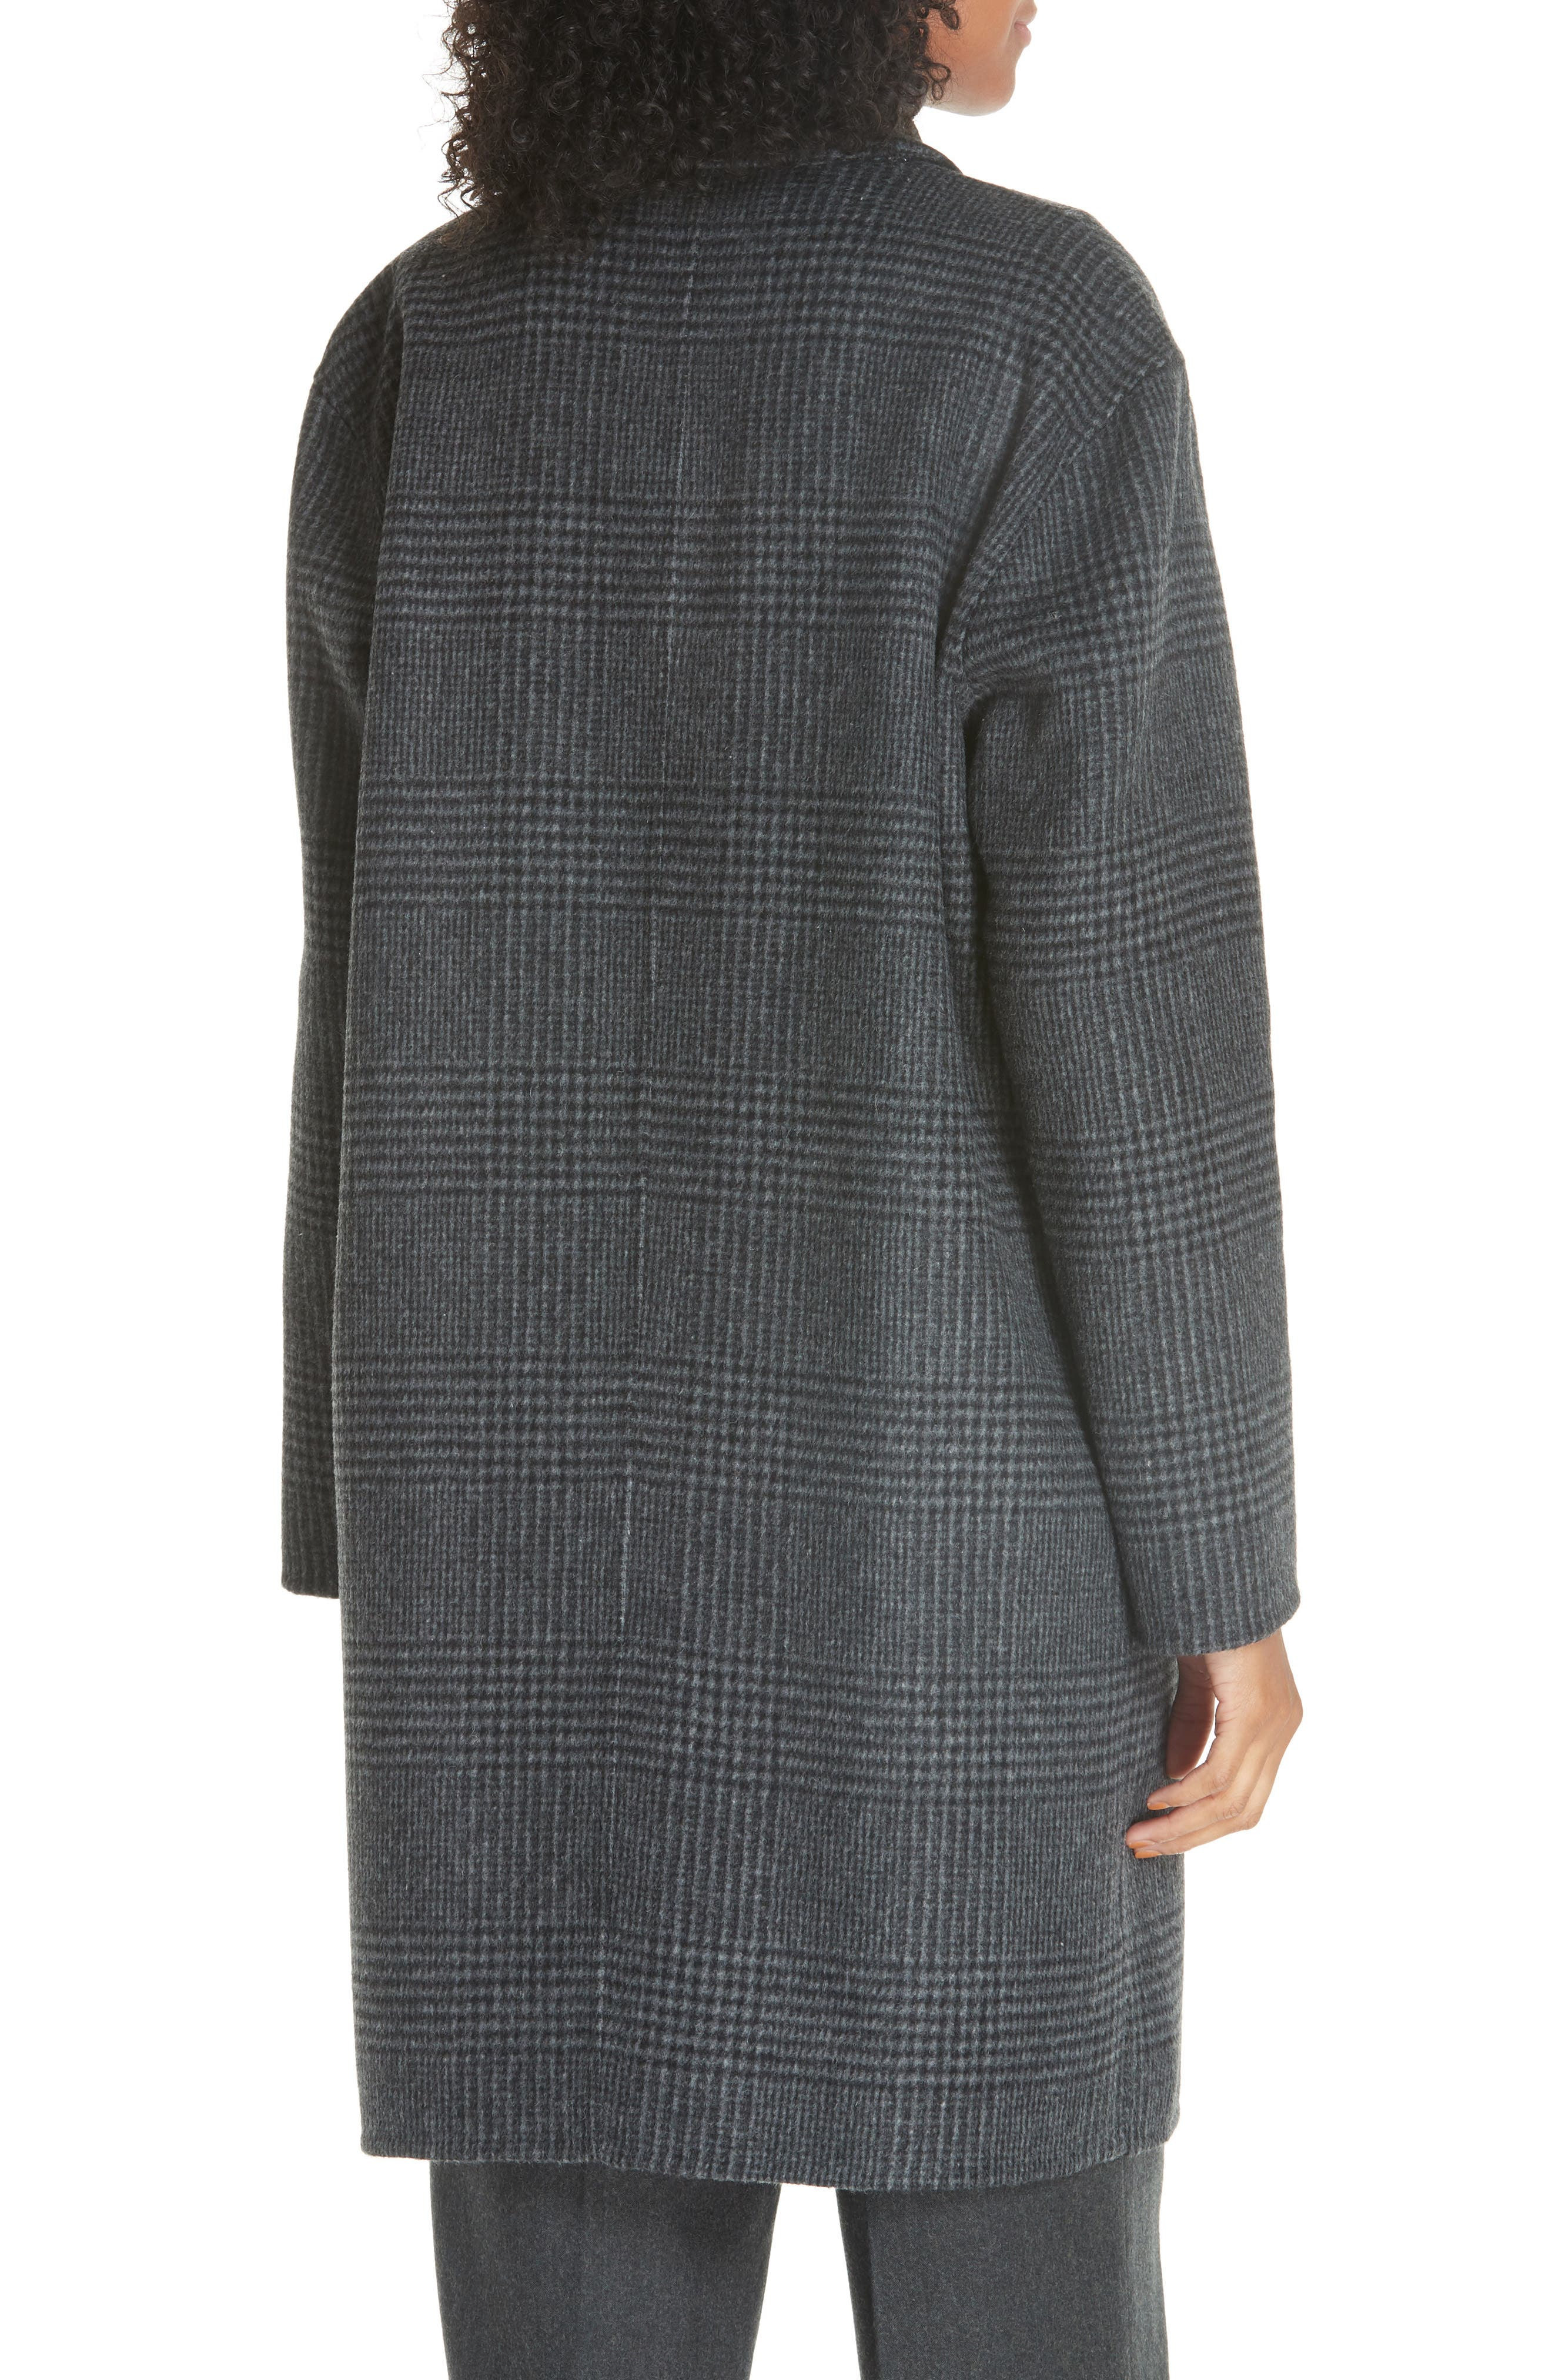 Plaid Wool Blend Coat,                             Alternate thumbnail 2, color,                             CHARCOAL GLEN PLAID